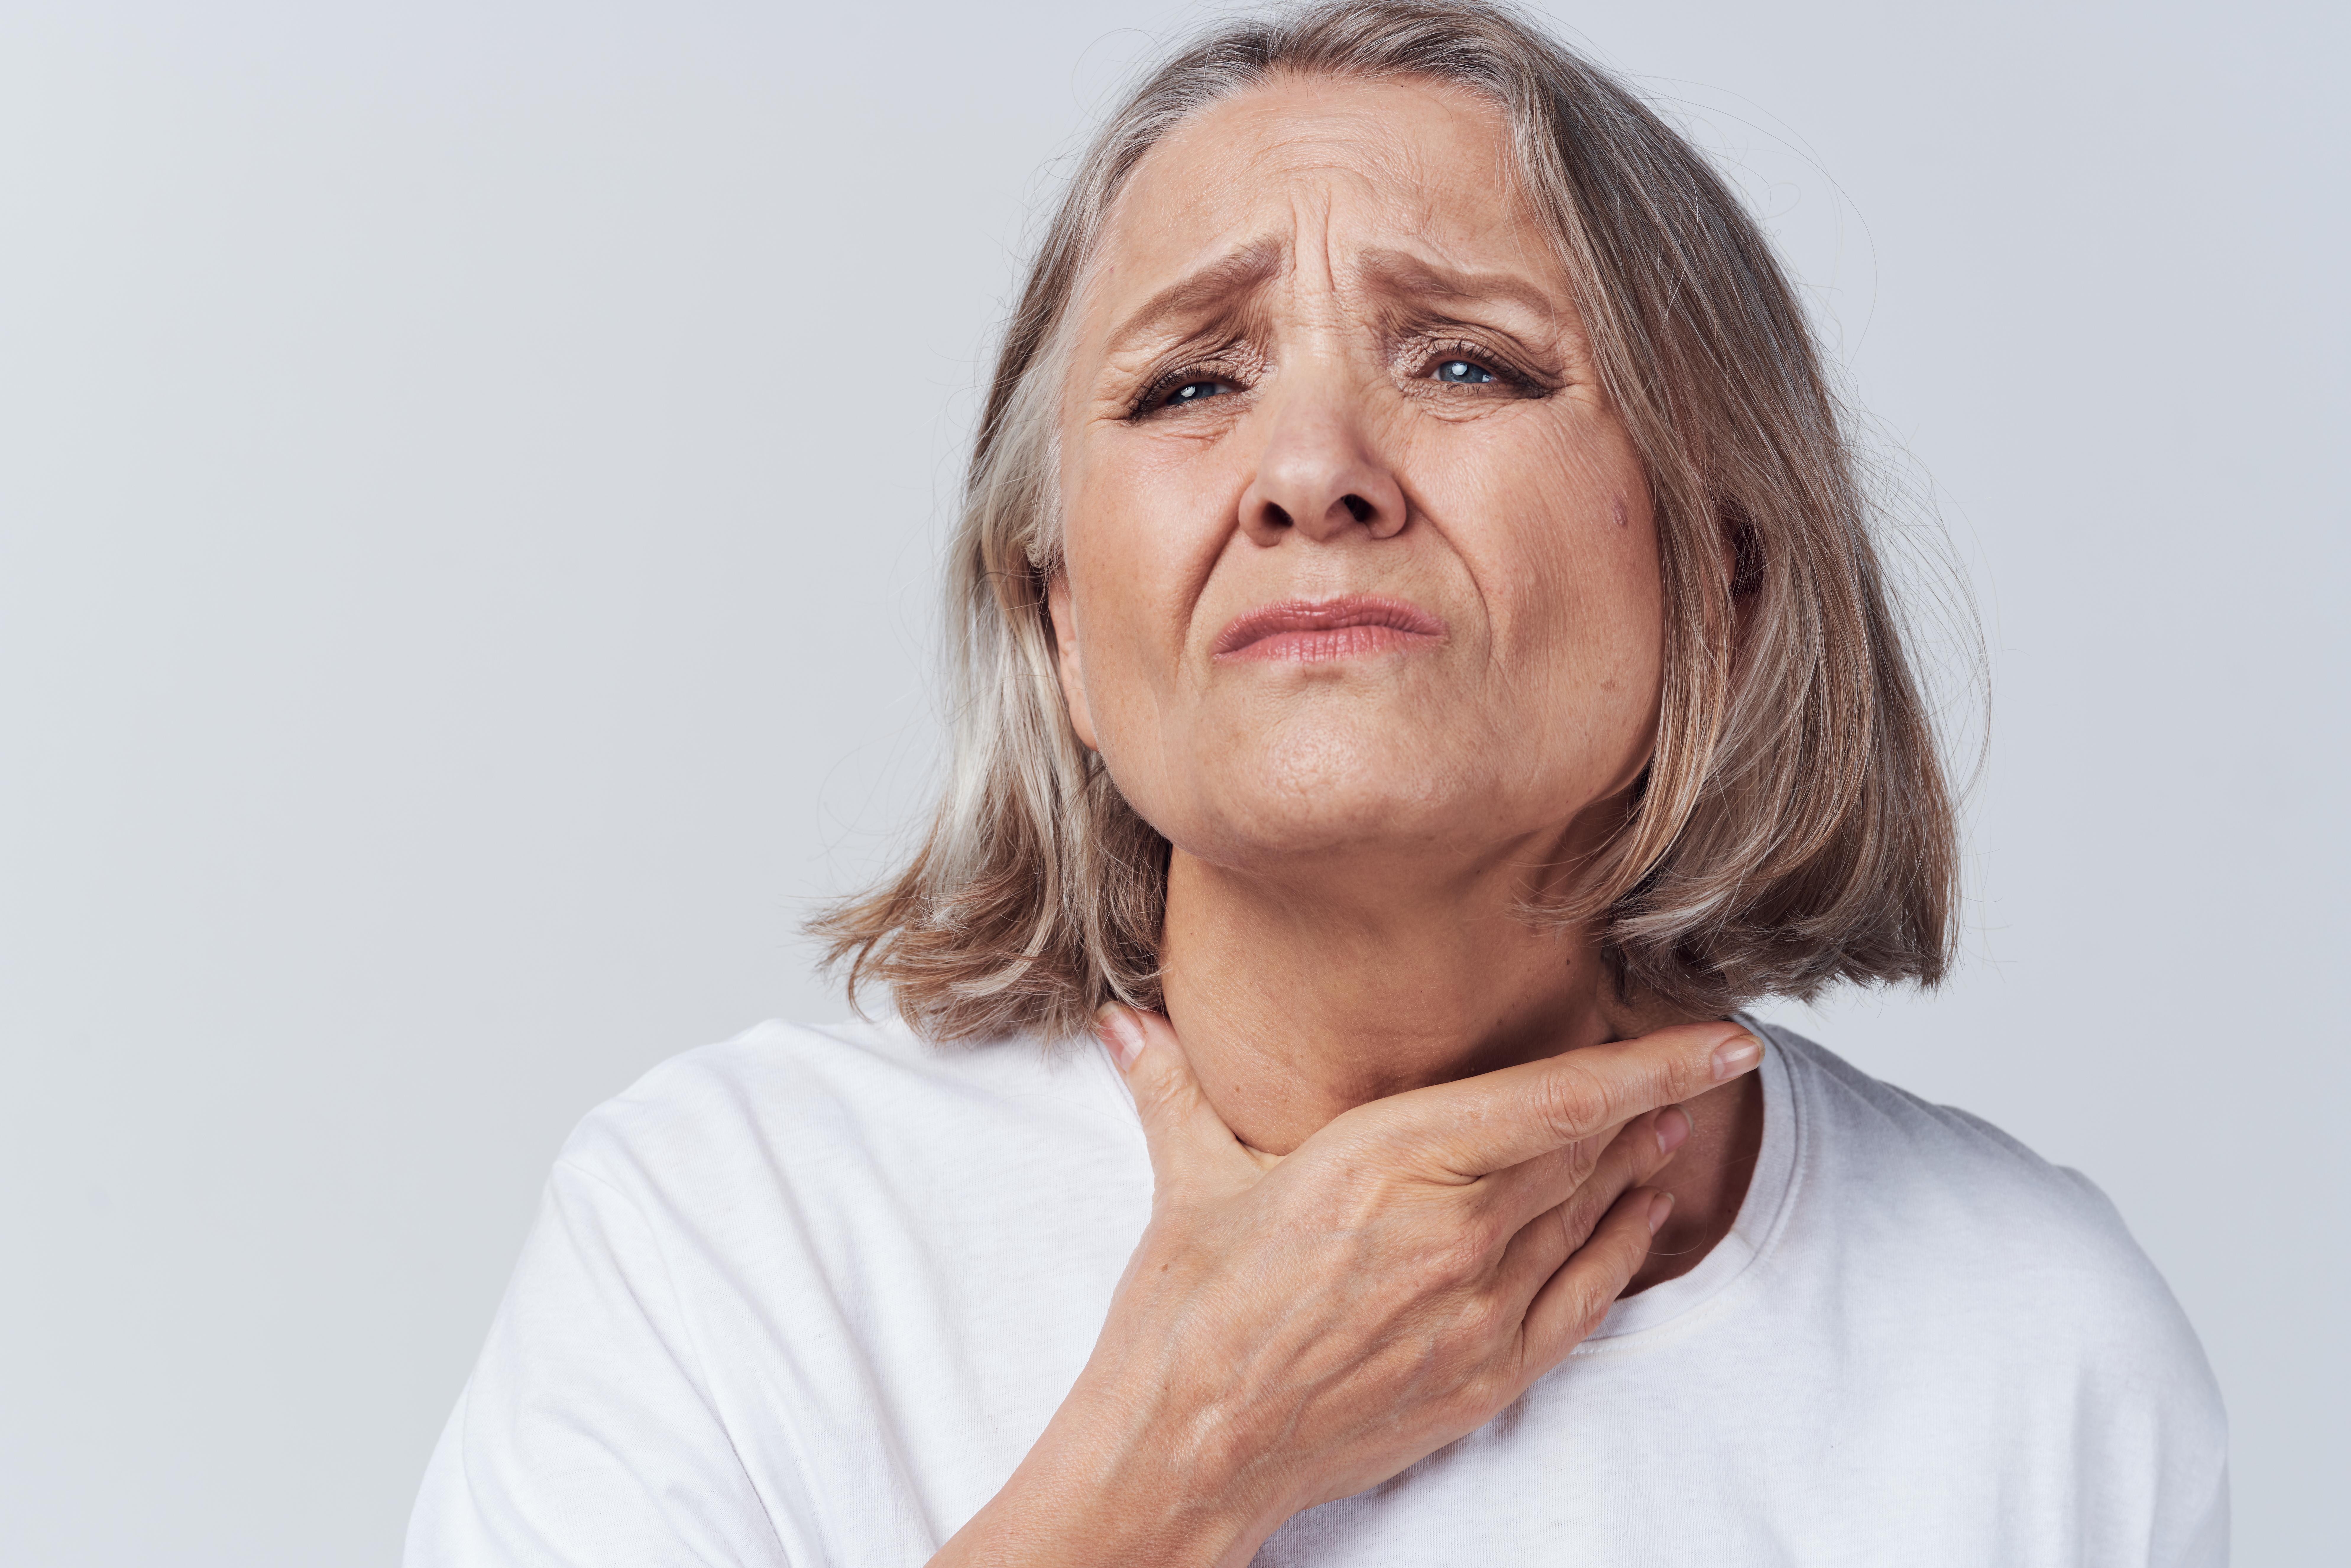 Bulbar Onset Symptoms vs. Laryngeal Cancer: Symptom Comparison